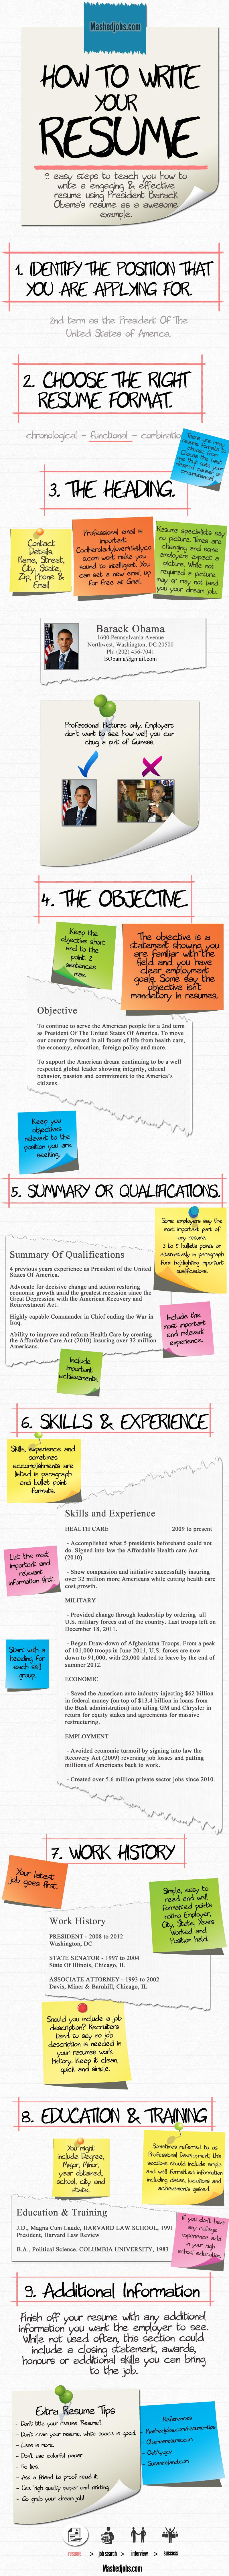 Cómo crear un Curriculum efectivo